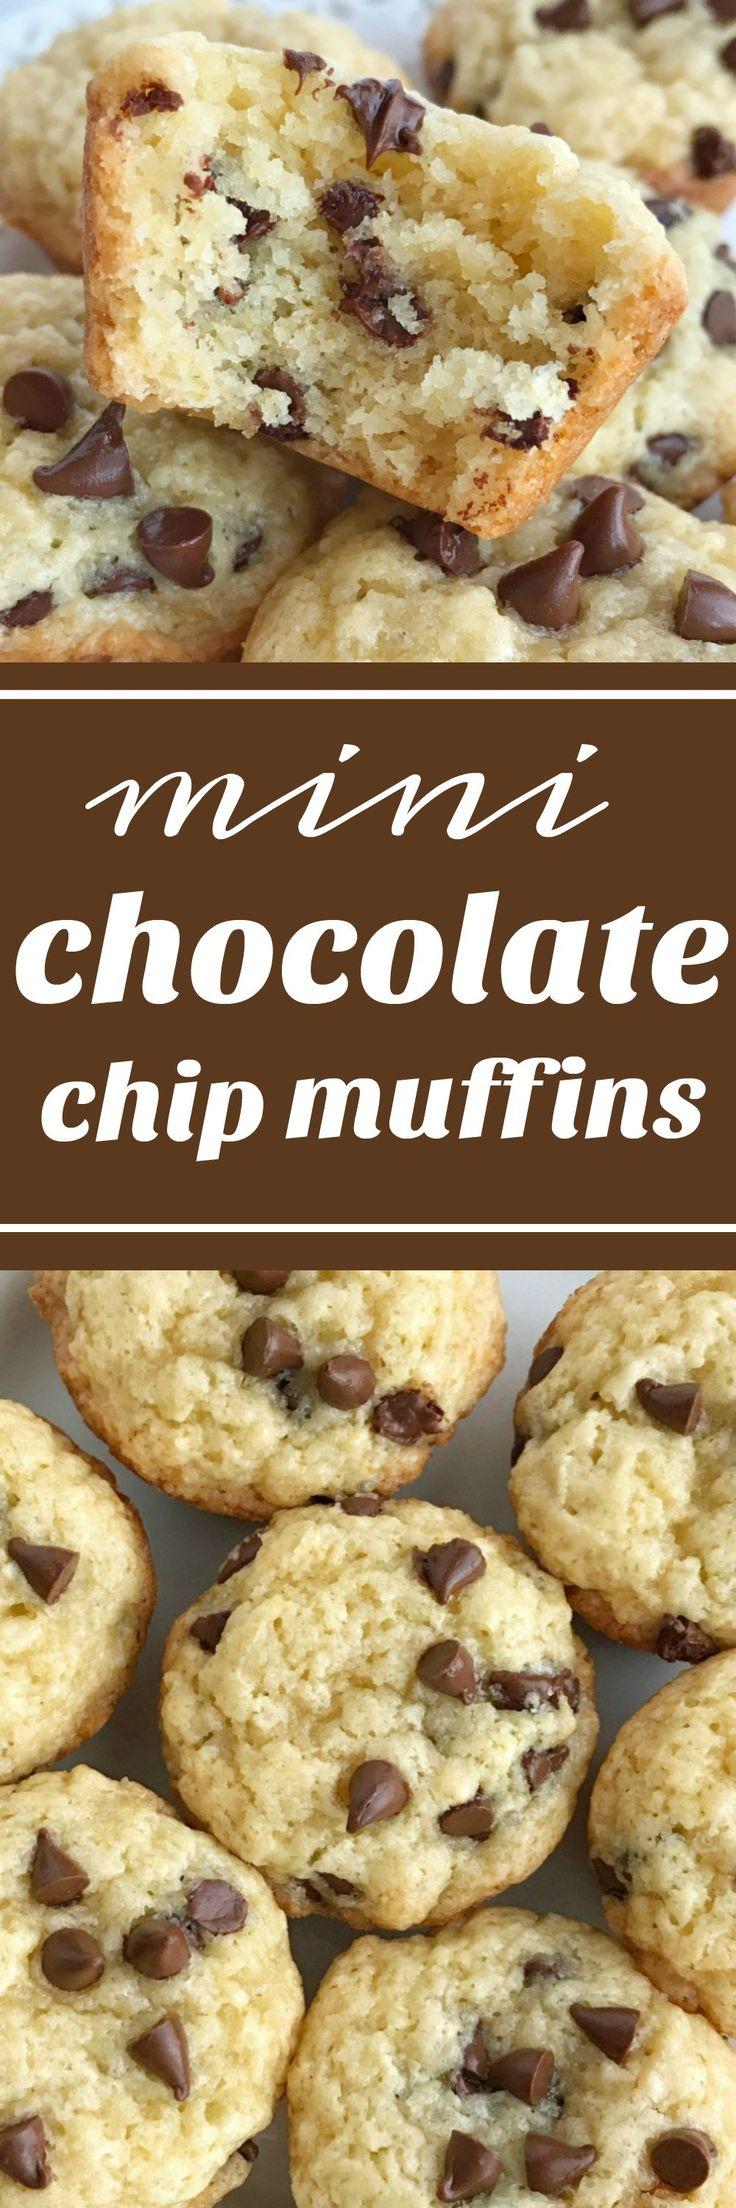 Muffins | Chocolate | Snack recipes | Mini muffins | Chocolate Chip Muffins | www.togetherasfamily.com #muffinrecipes #chocolate #minimuffins #chocolatechipmuffins